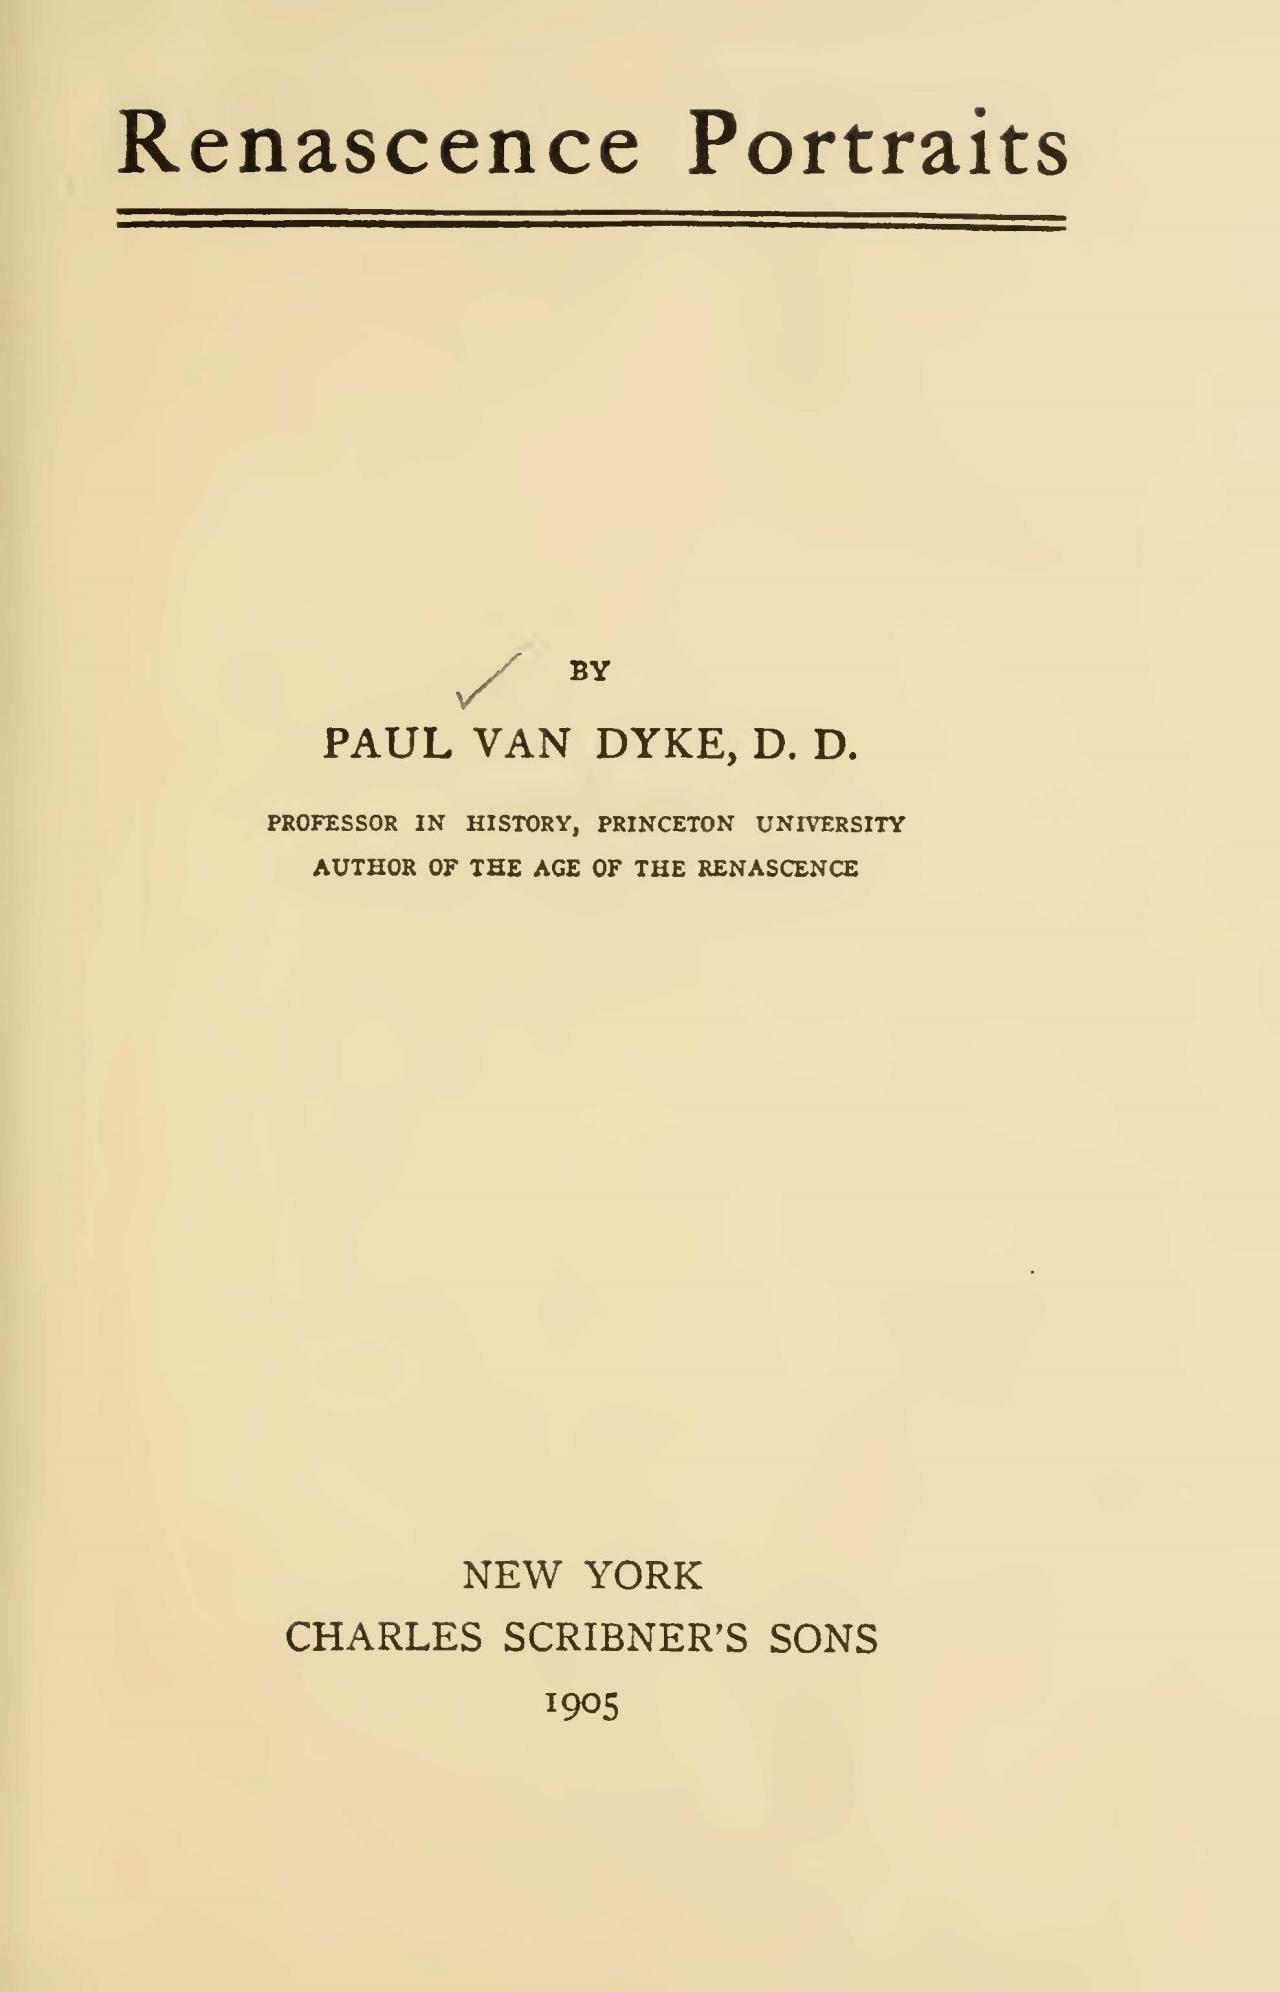 Van Dyke, Paul, Renascence Portraits Title Page.jpg